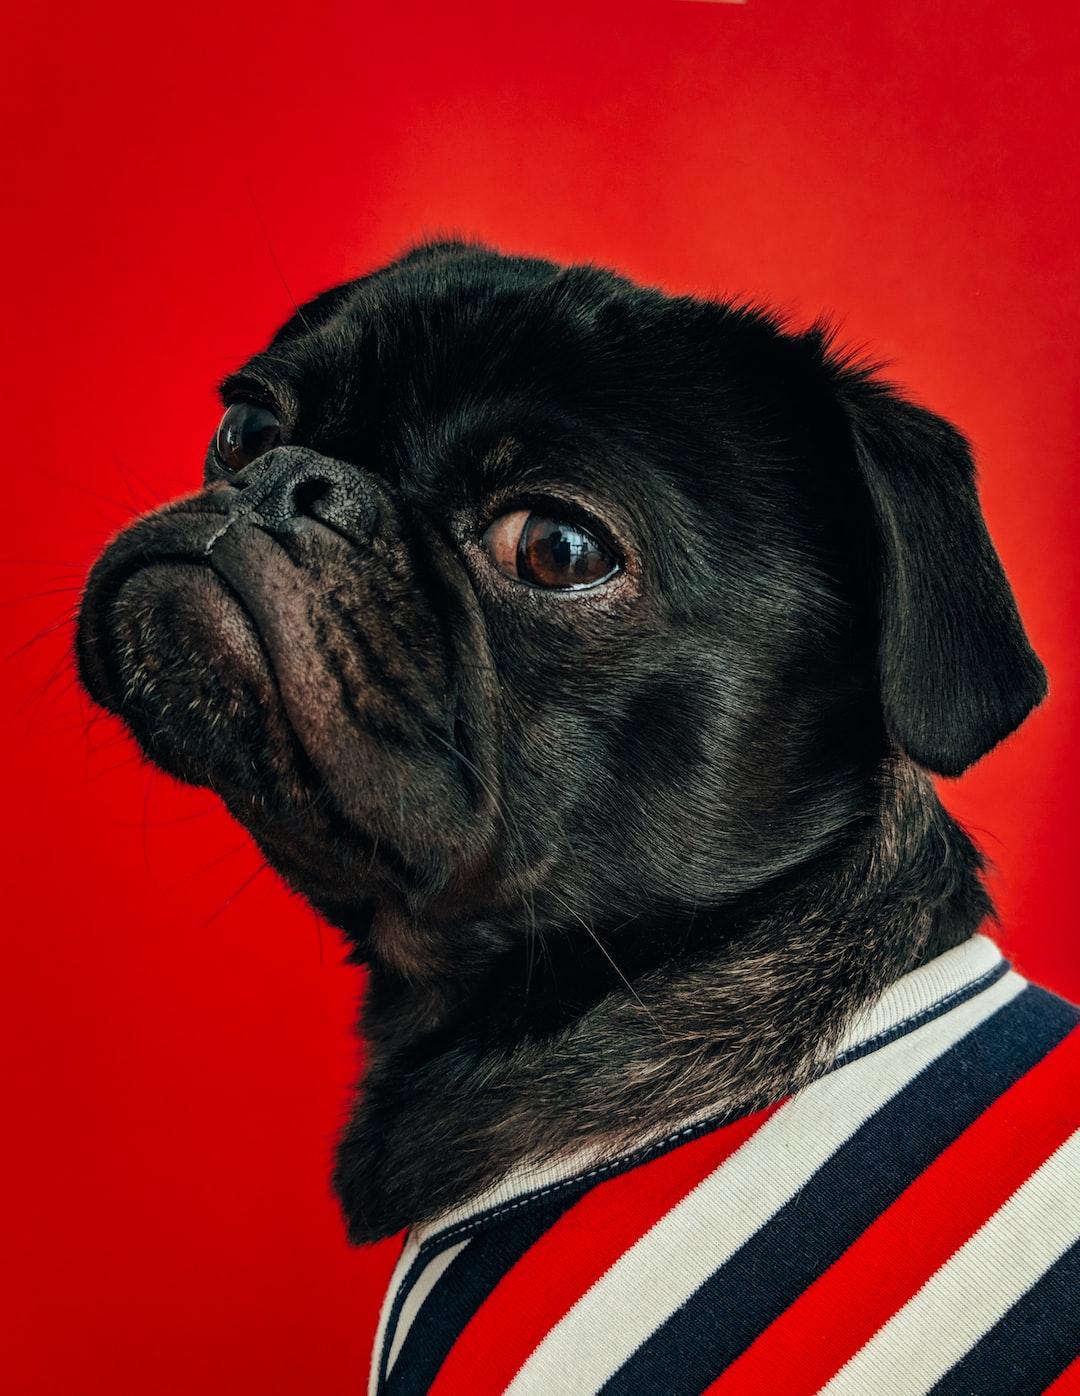 Doggy with style. (instagram.com/toshi.dog/)